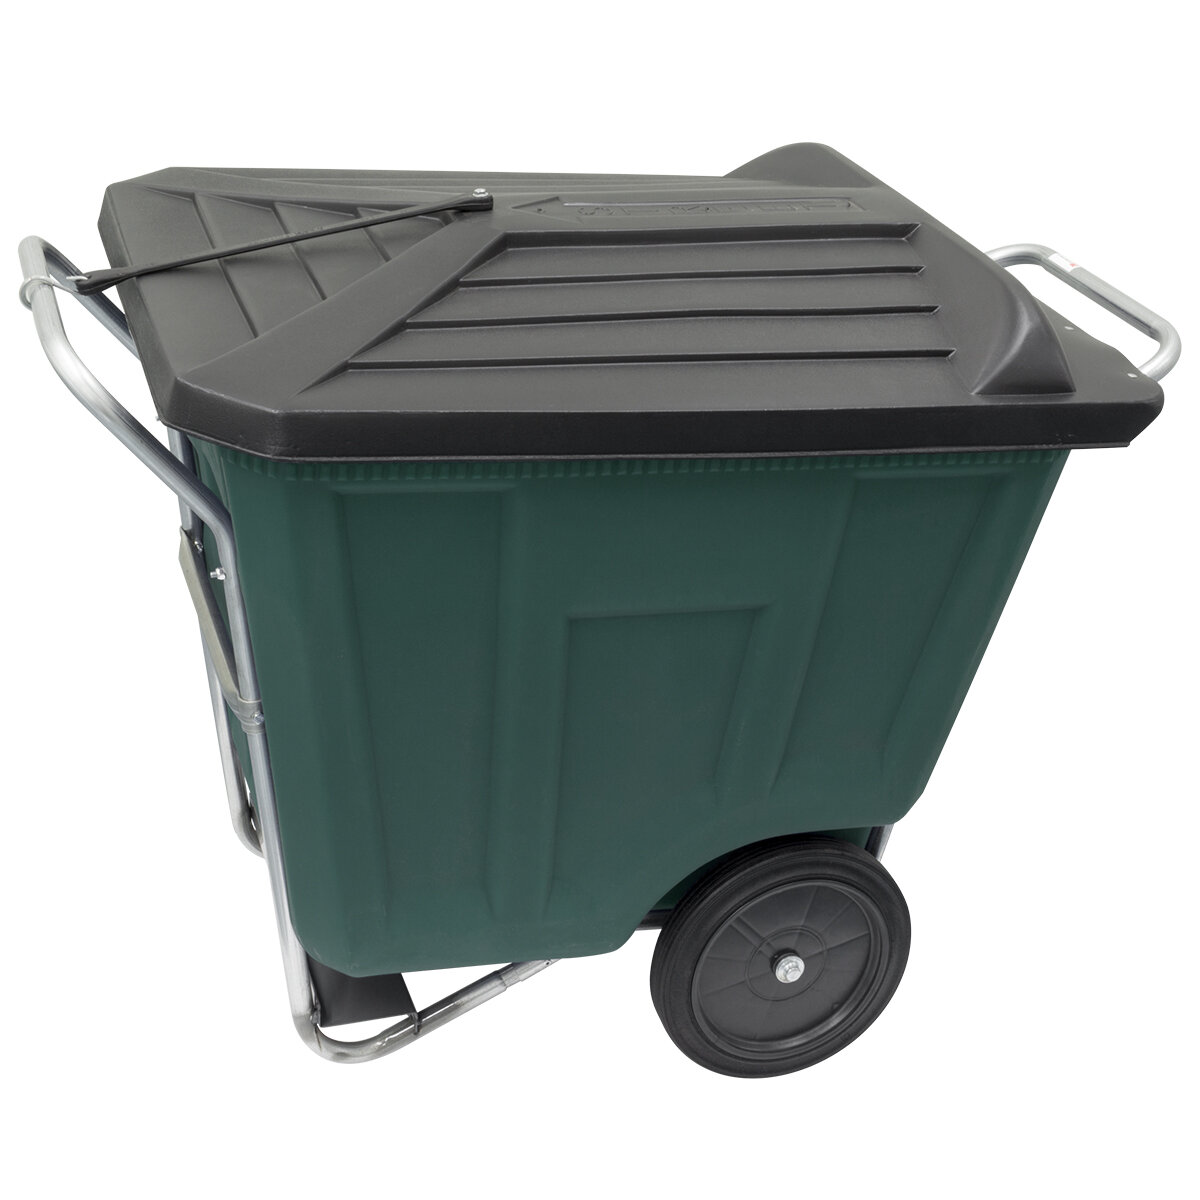 Akro Mils 90 Gallon Trash Bin | Wayfair